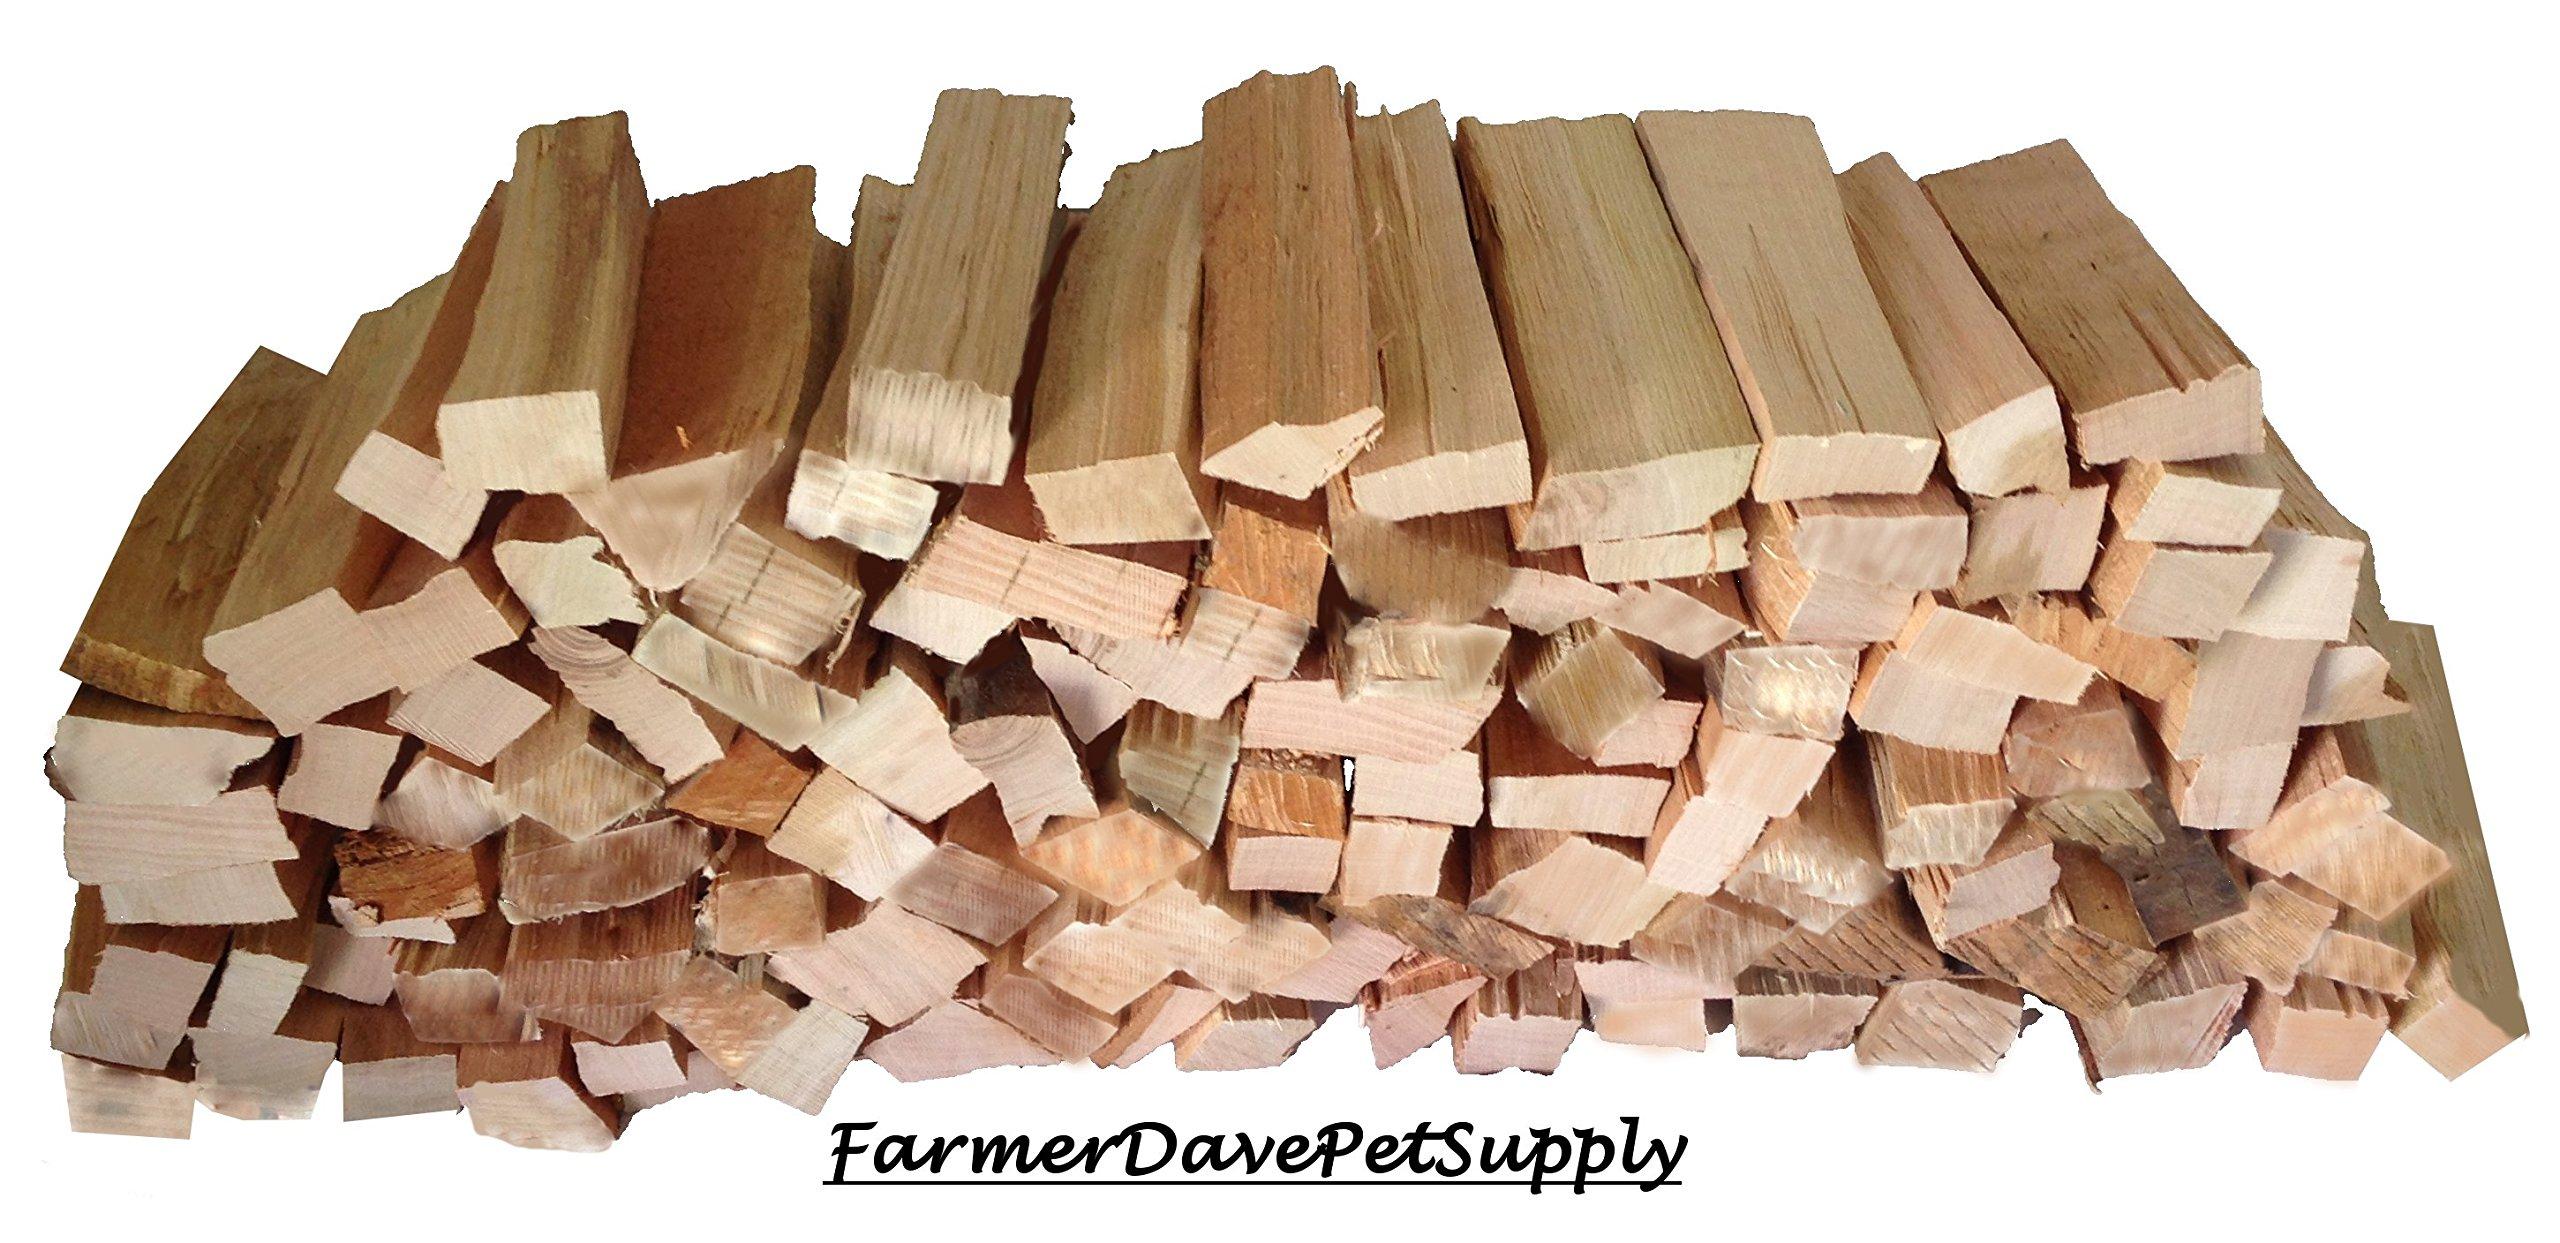 FarmerDavePetSupply 1200 Cubic Inch Cherry BBQ Grilling Smoker Wood Splits